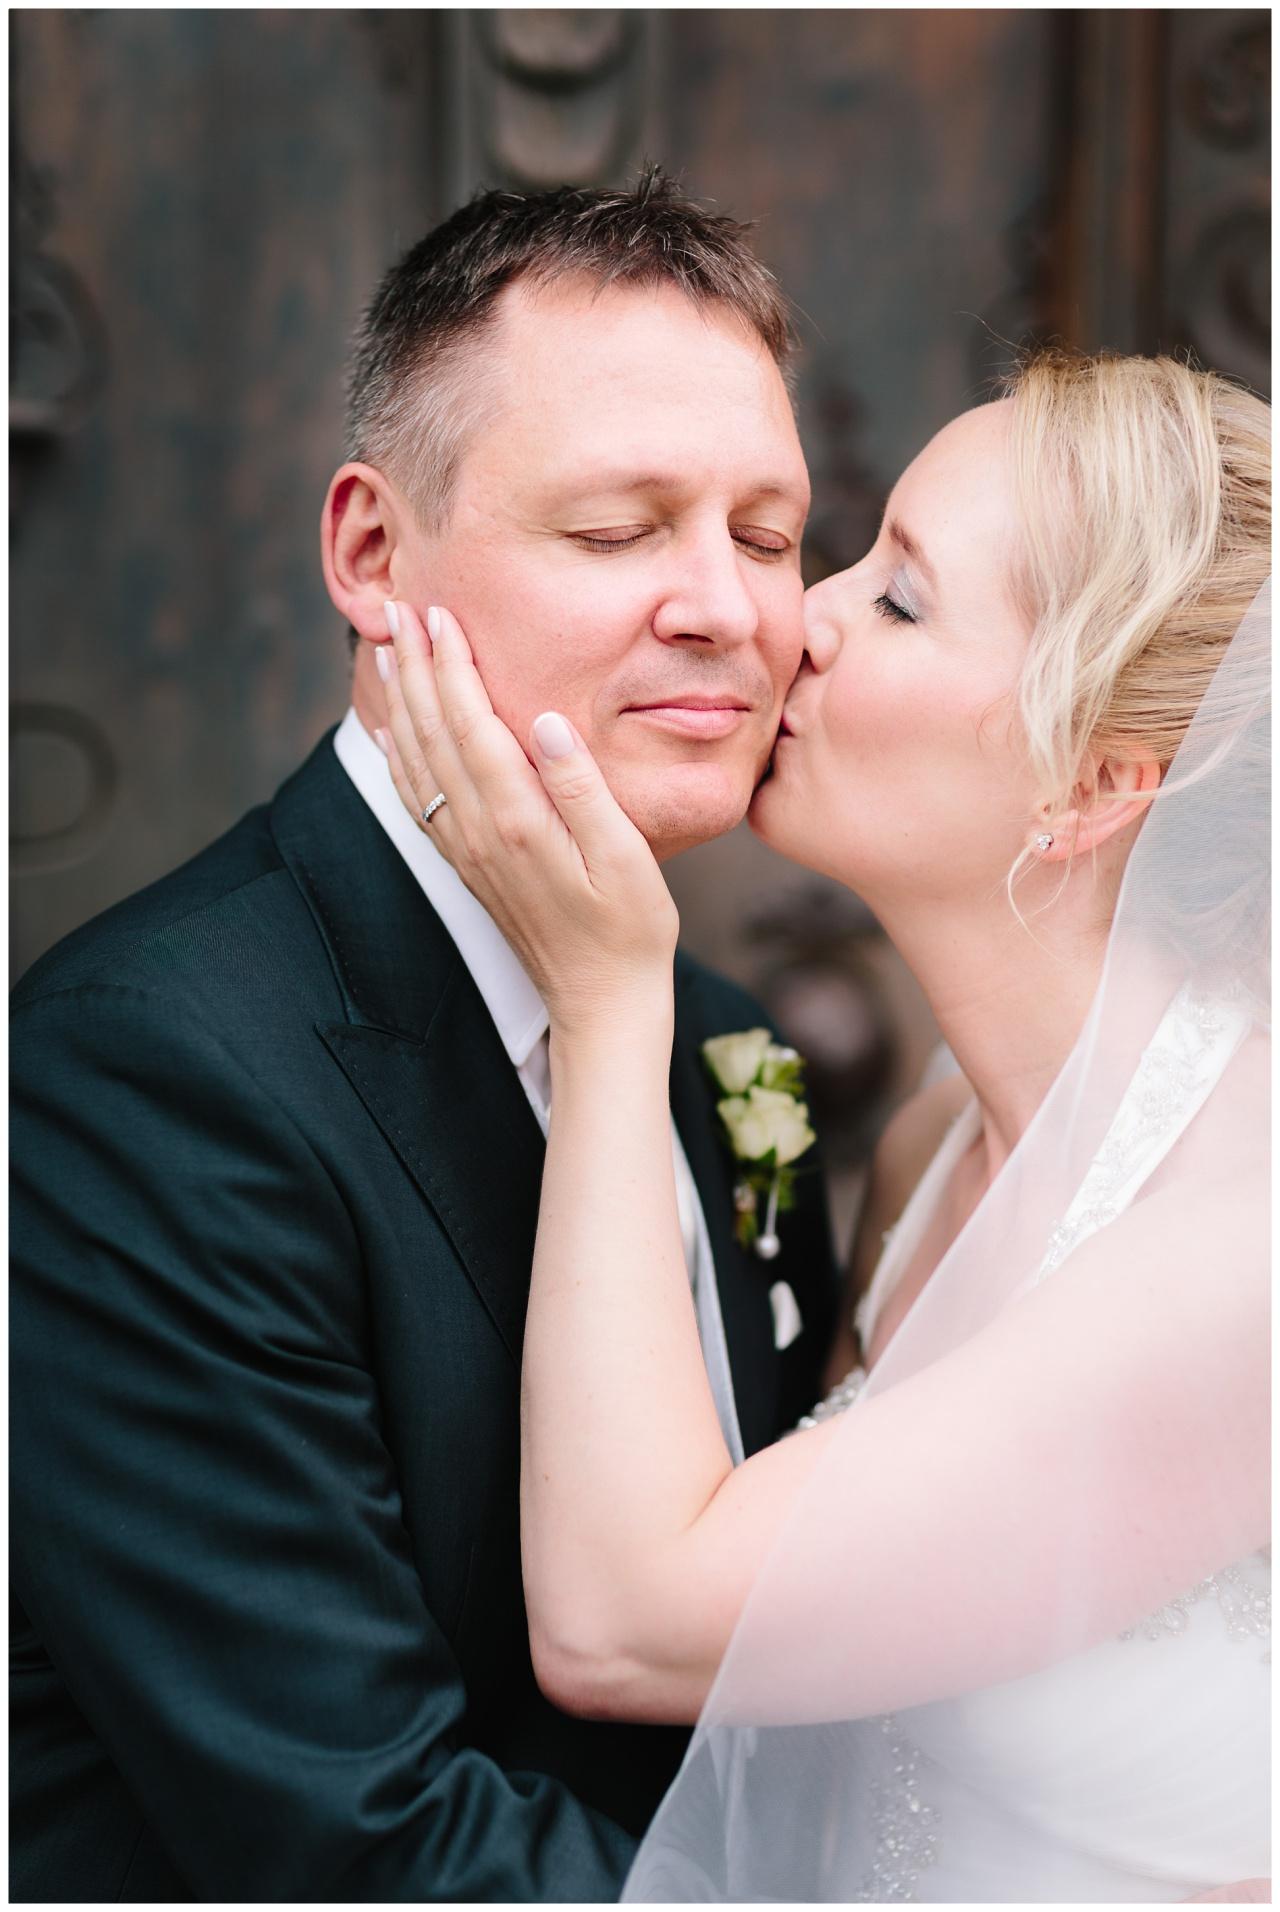 Hochzeitsfotograf Seefeld Triendlsaege 12